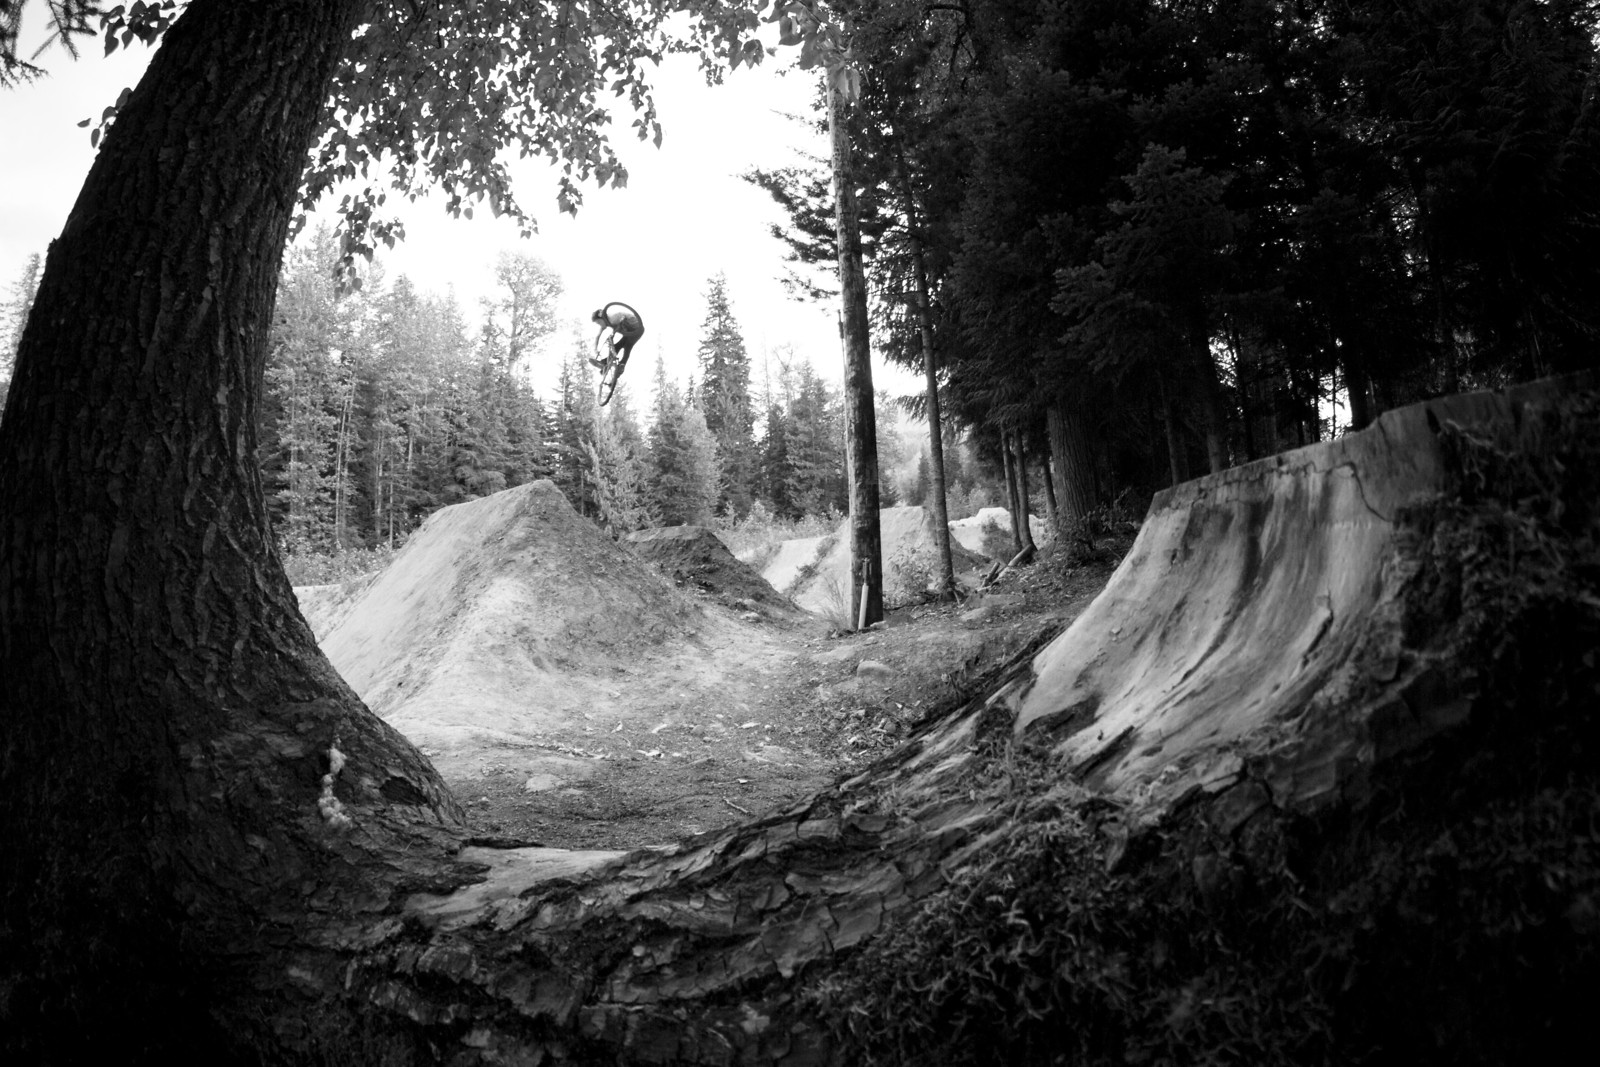 Mike Unturndown River Jumps  - jamieledson - Mountain Biking Pictures - Vital MTB